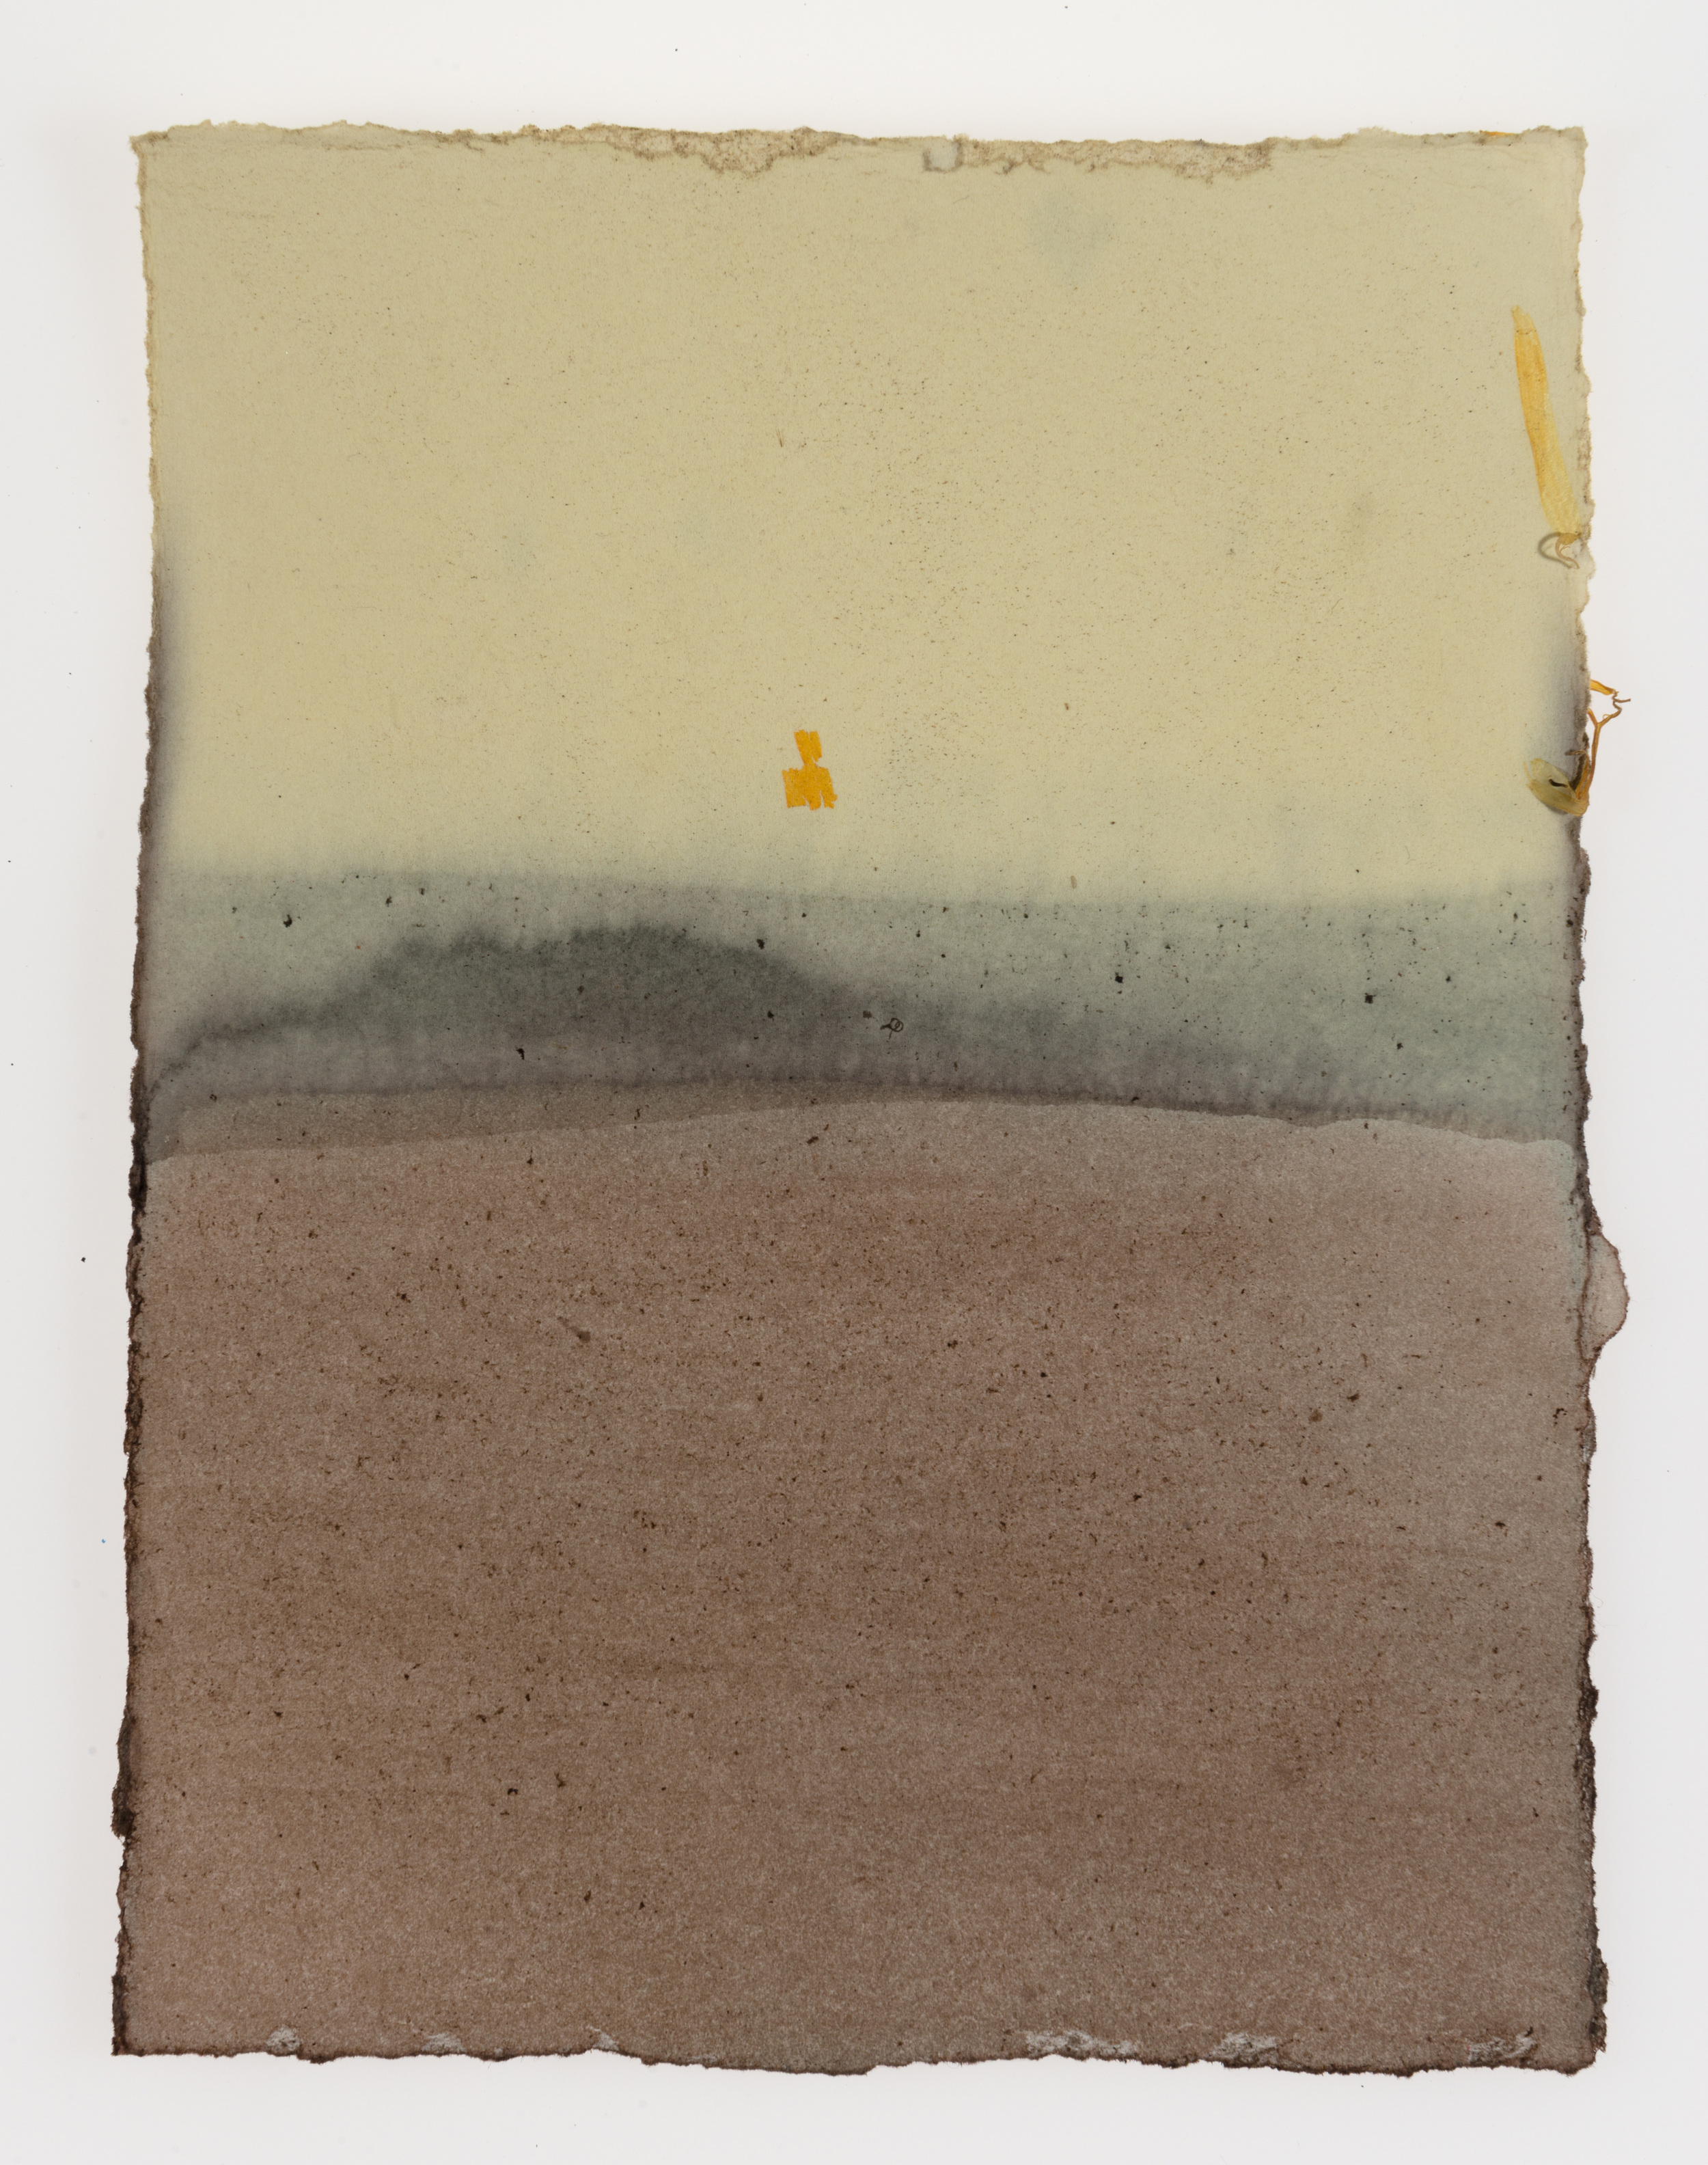 Cornelia White Swann,  Beyond the Horizon , 2015. Marigold, madder tood, and henna on paper, 7 1/2 x 5 3/4 inches. Documented February 2015.